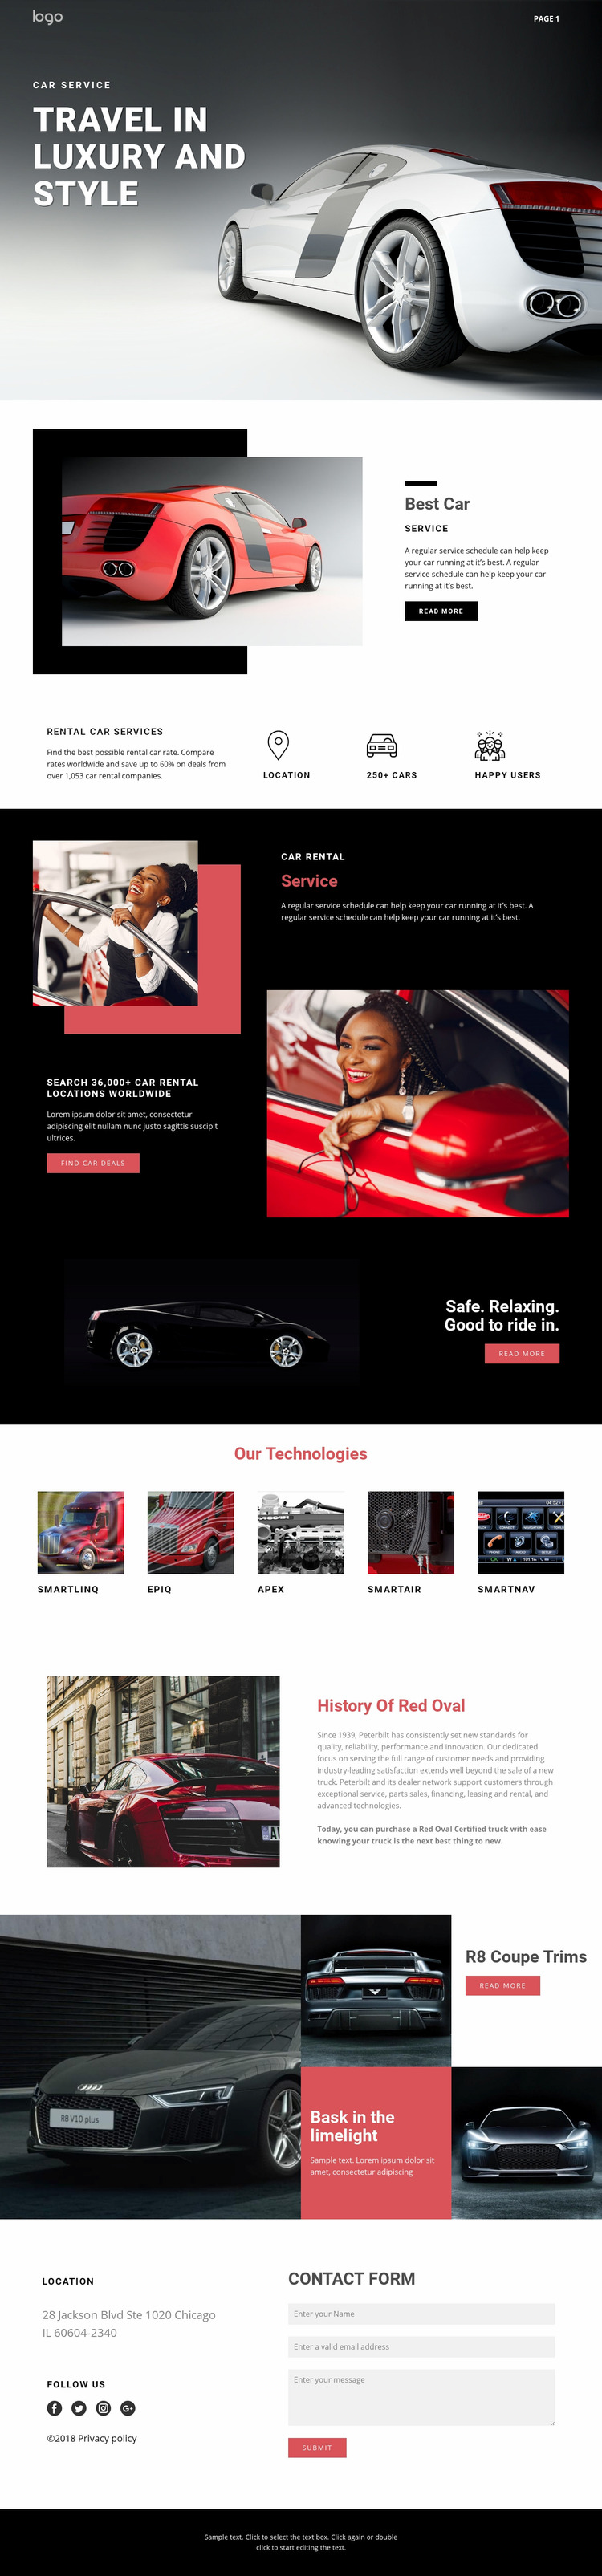 Traveling in luxury cars Website Maker